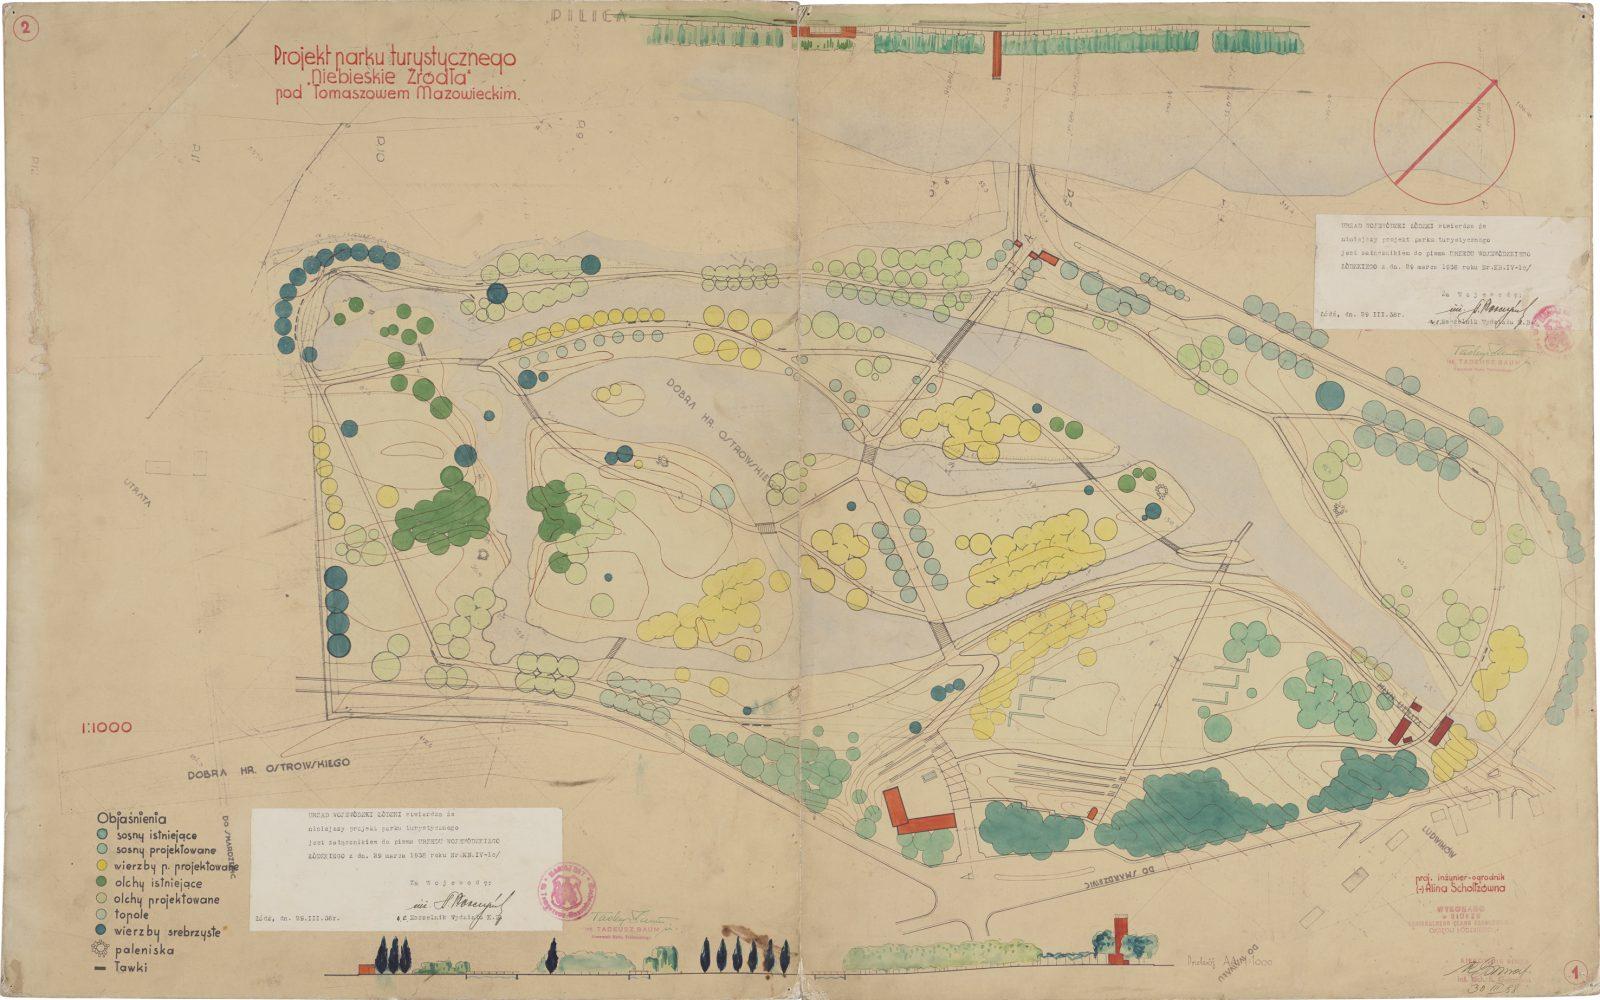 Design of Blue Springs Park near Tomaszów Mazowiecki. Designed by Alina Scholtz, 1938, ozalid, watercolour. Private property